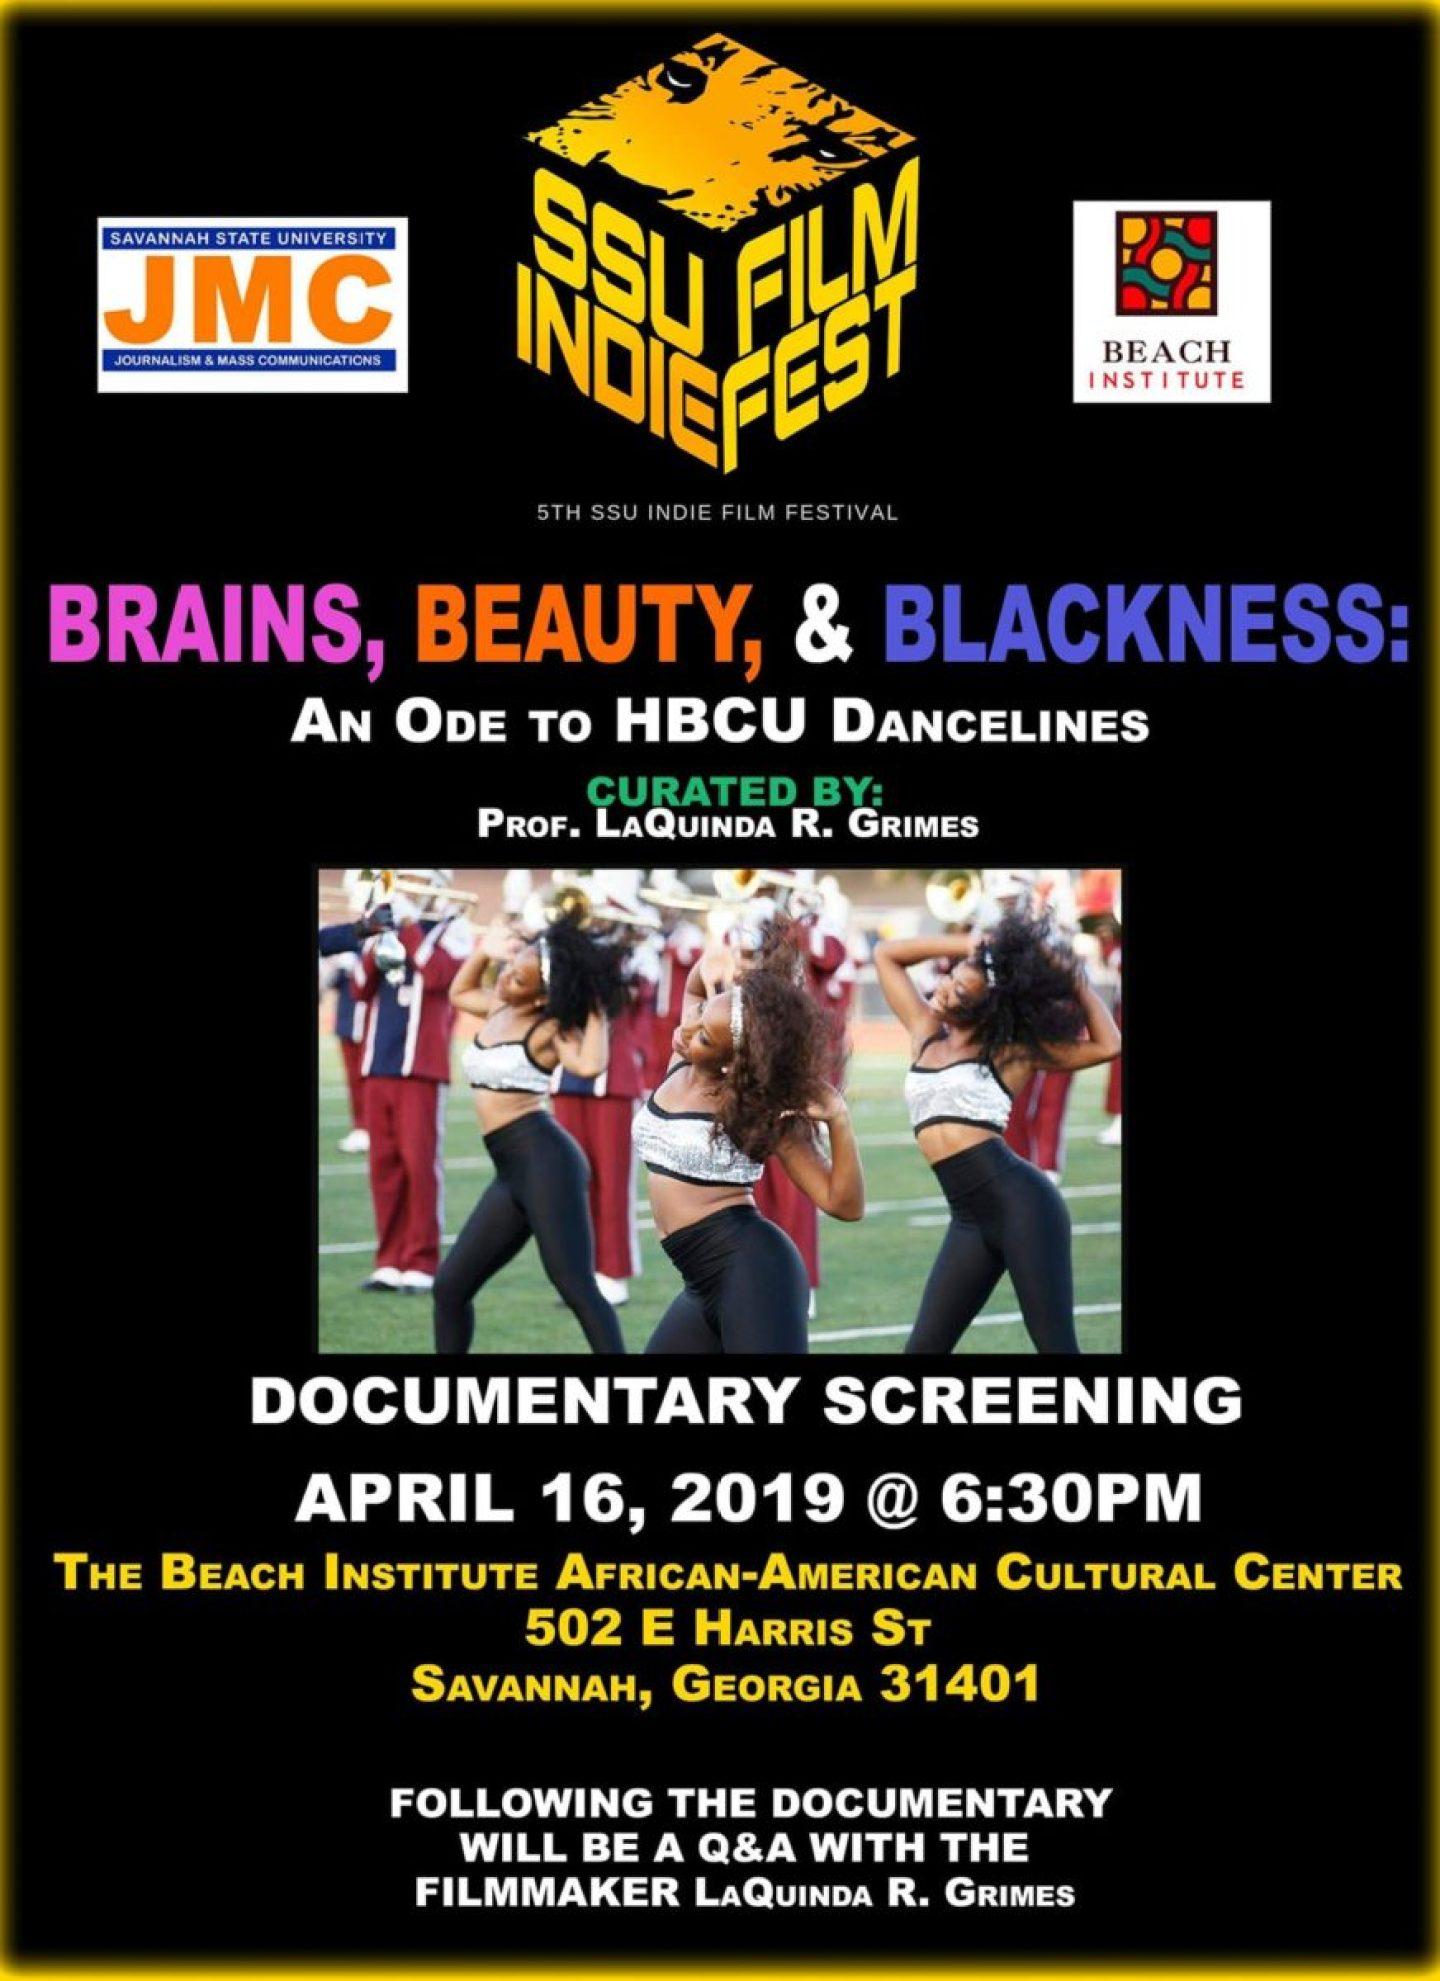 57019506_2178151342281254_4319309529956220928_o-1440x1981 HBCU Arts: Savannah State University Film Fest Bolsters the Next Generation of Film Makers